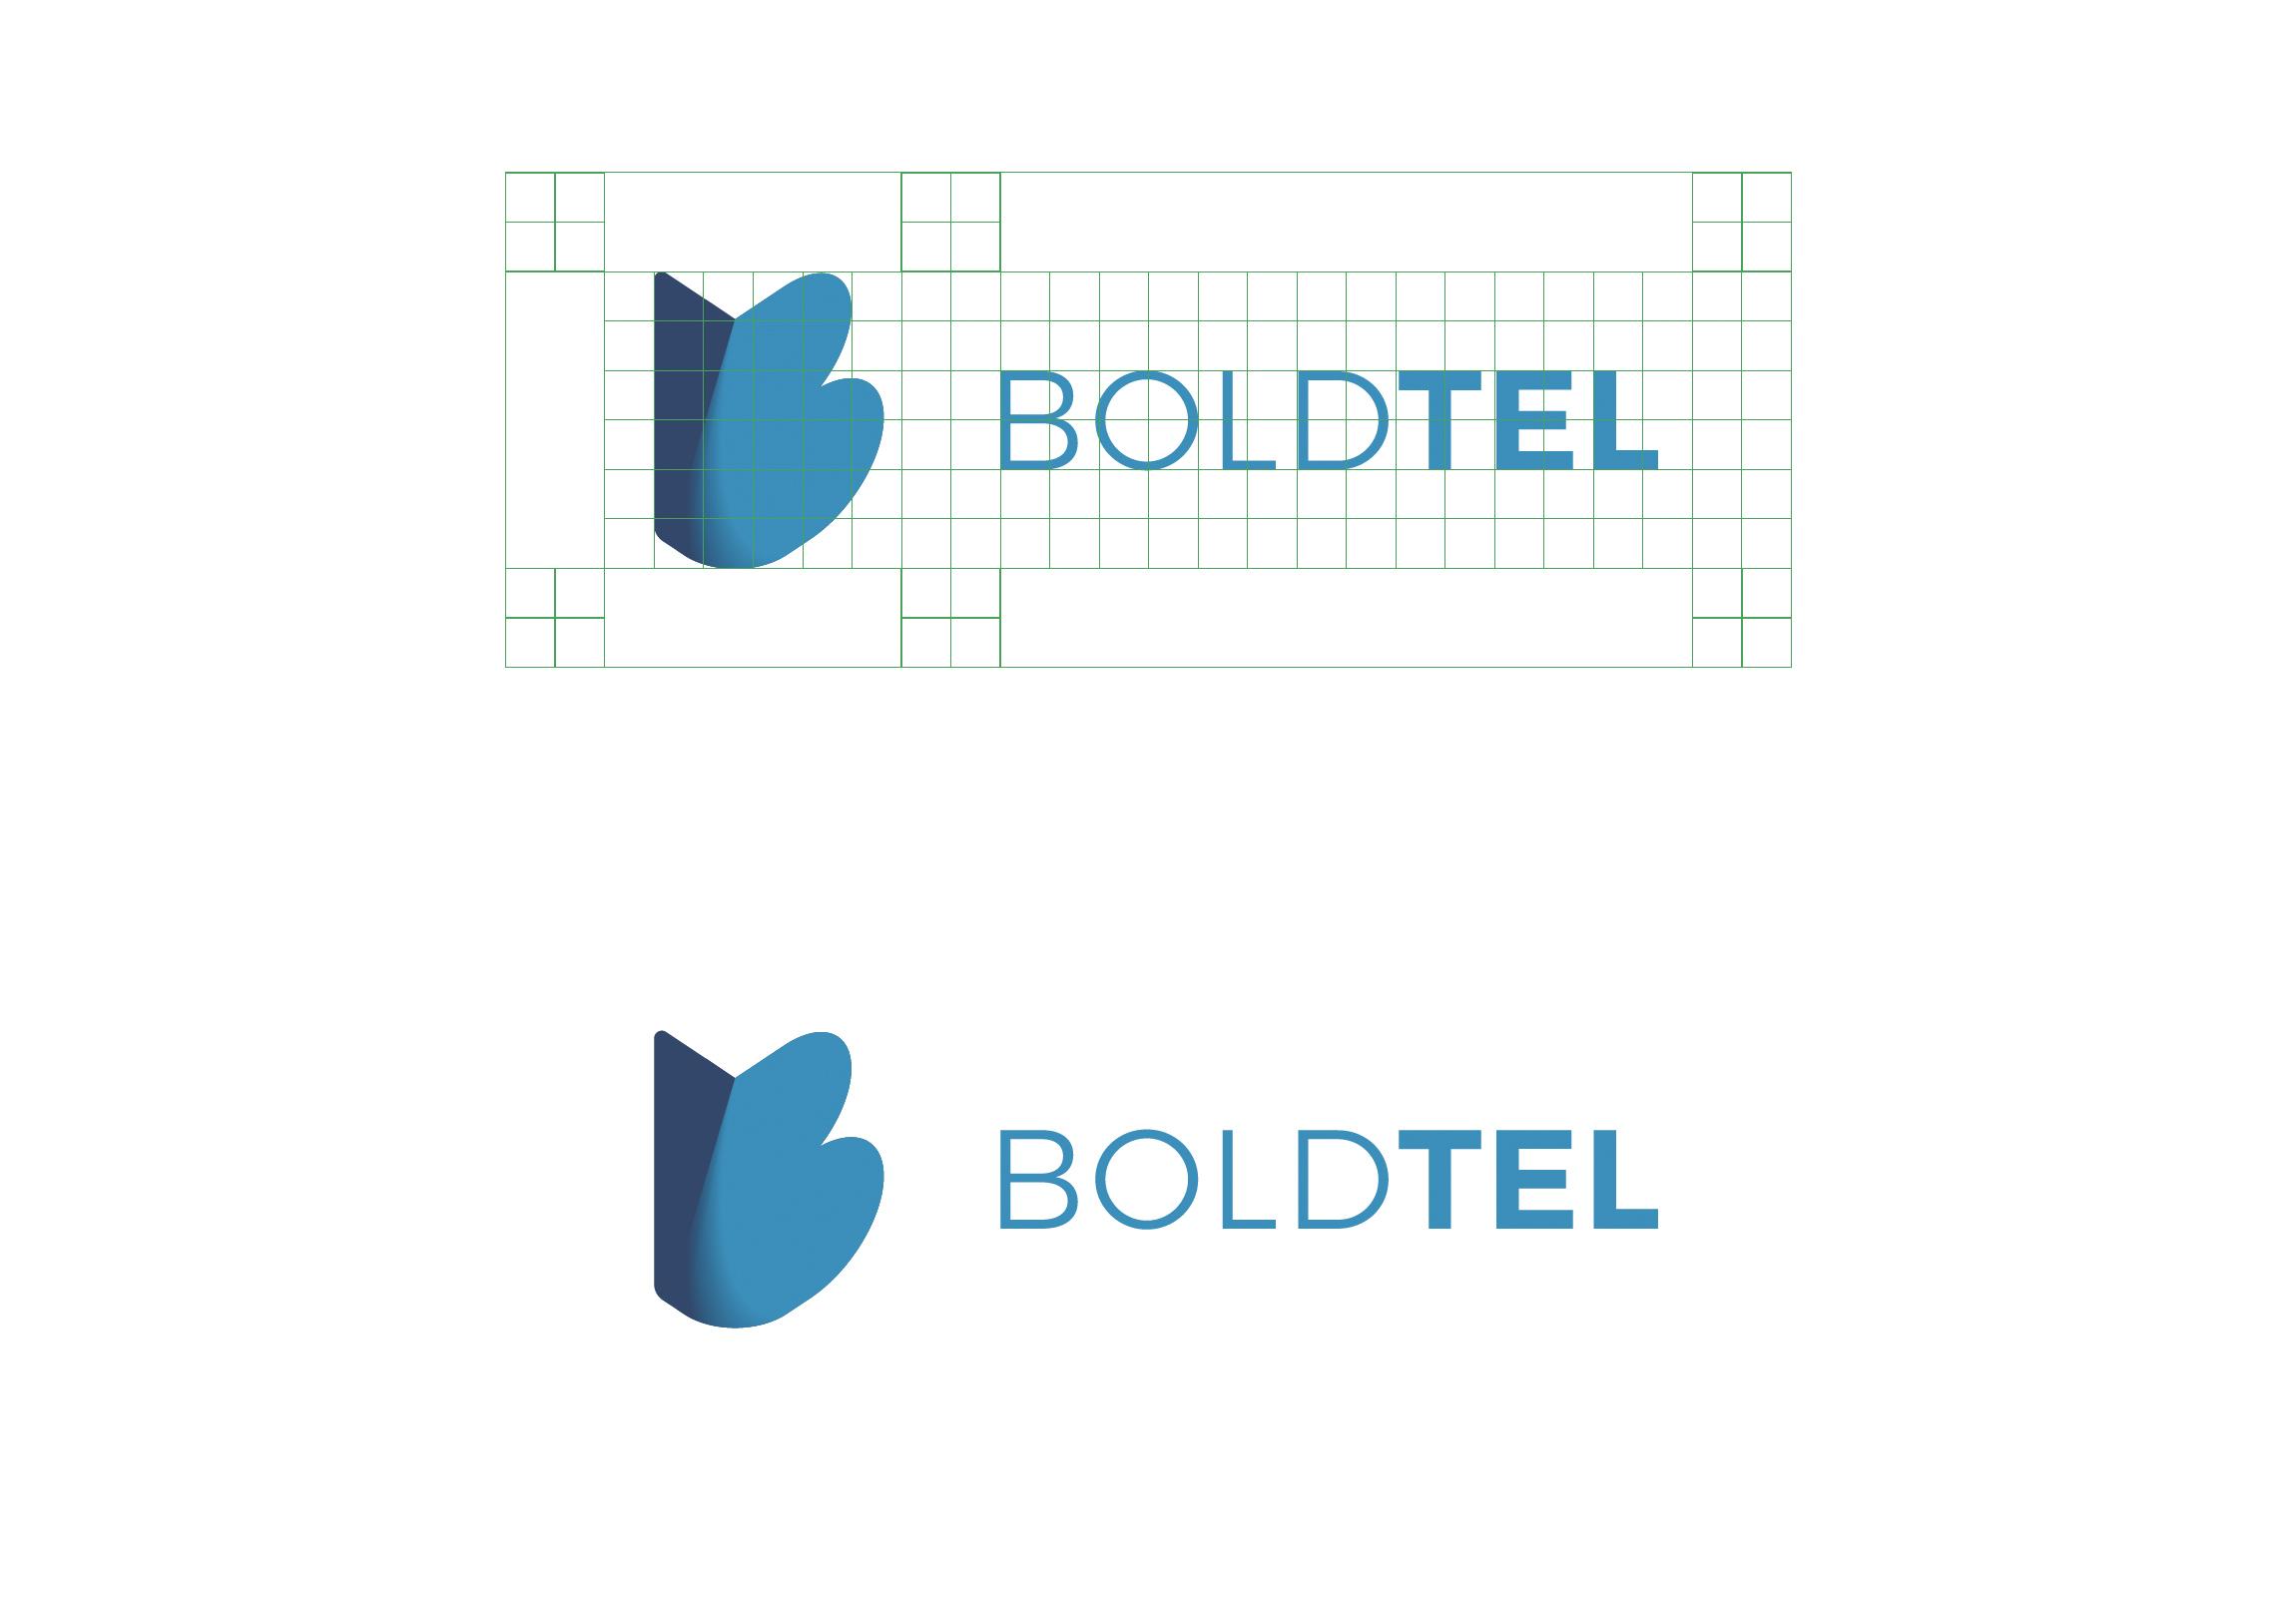 boldtel_gal_02.jpg